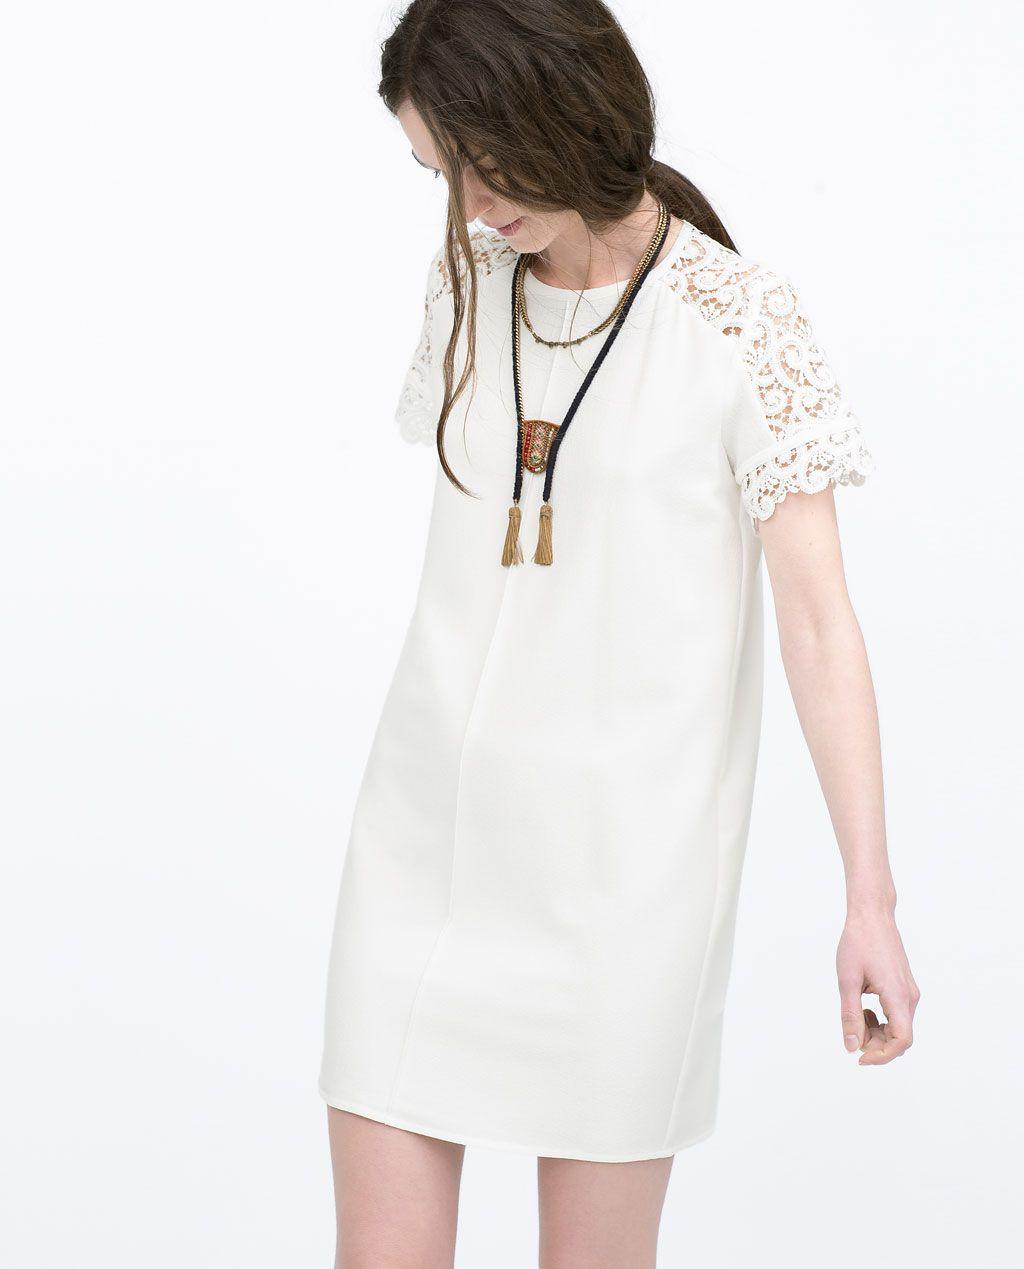 White lace dress zara  Image  of LOOSE DRESS WITH GUIPURE YOKE from Zara  boho lux